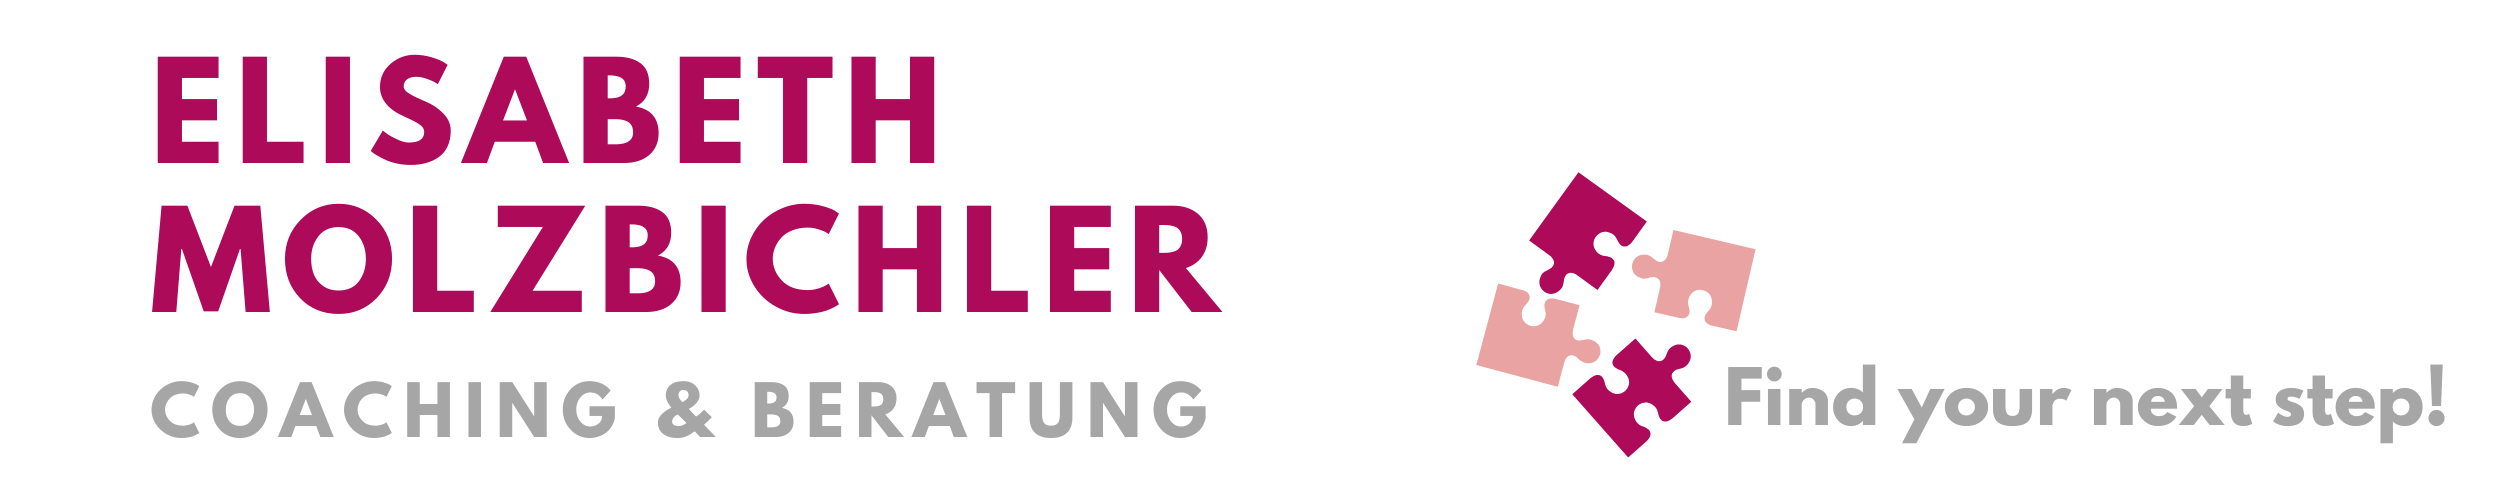 Elisabeth Molzbichler